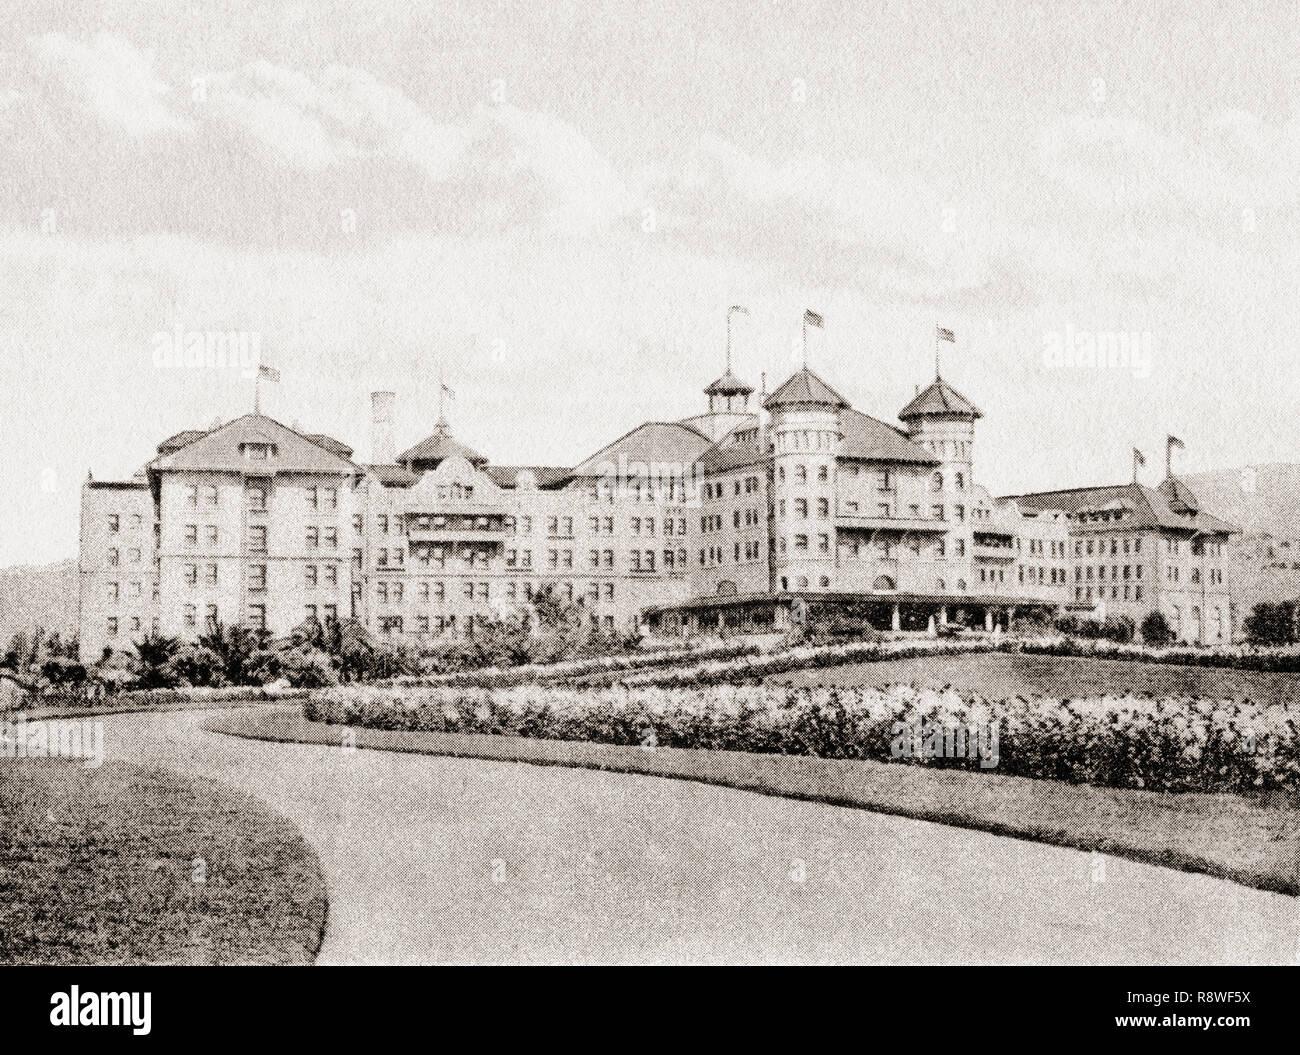 The Potter Hotel, Santa Barbara, California, United States of America, c. 1915.  From Wonderful California, published 1915. - Stock Image